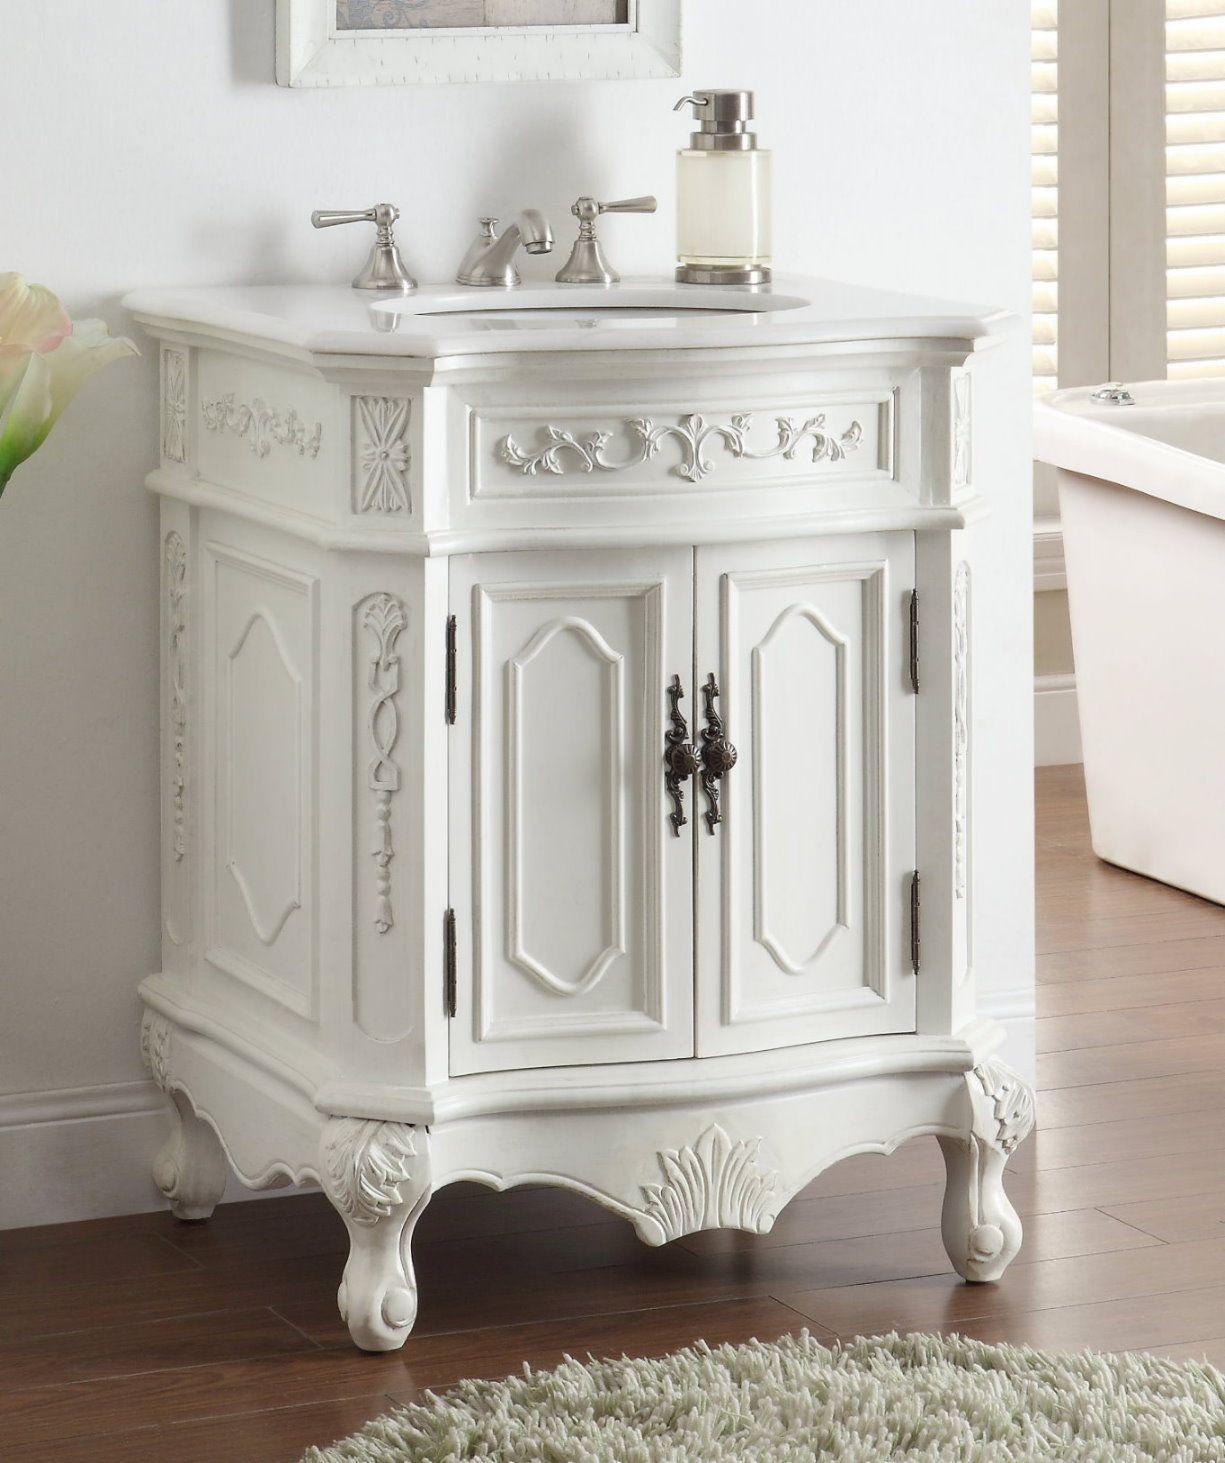 Model Ba 2844 Horton Bathroom Vanity Size 21 5x21 5x34 5 14 Gif 1225 1463 Single Sink Bathroom Vanity White Vanity Bathroom Furniture Vanity [ 1463 x 1225 Pixel ]